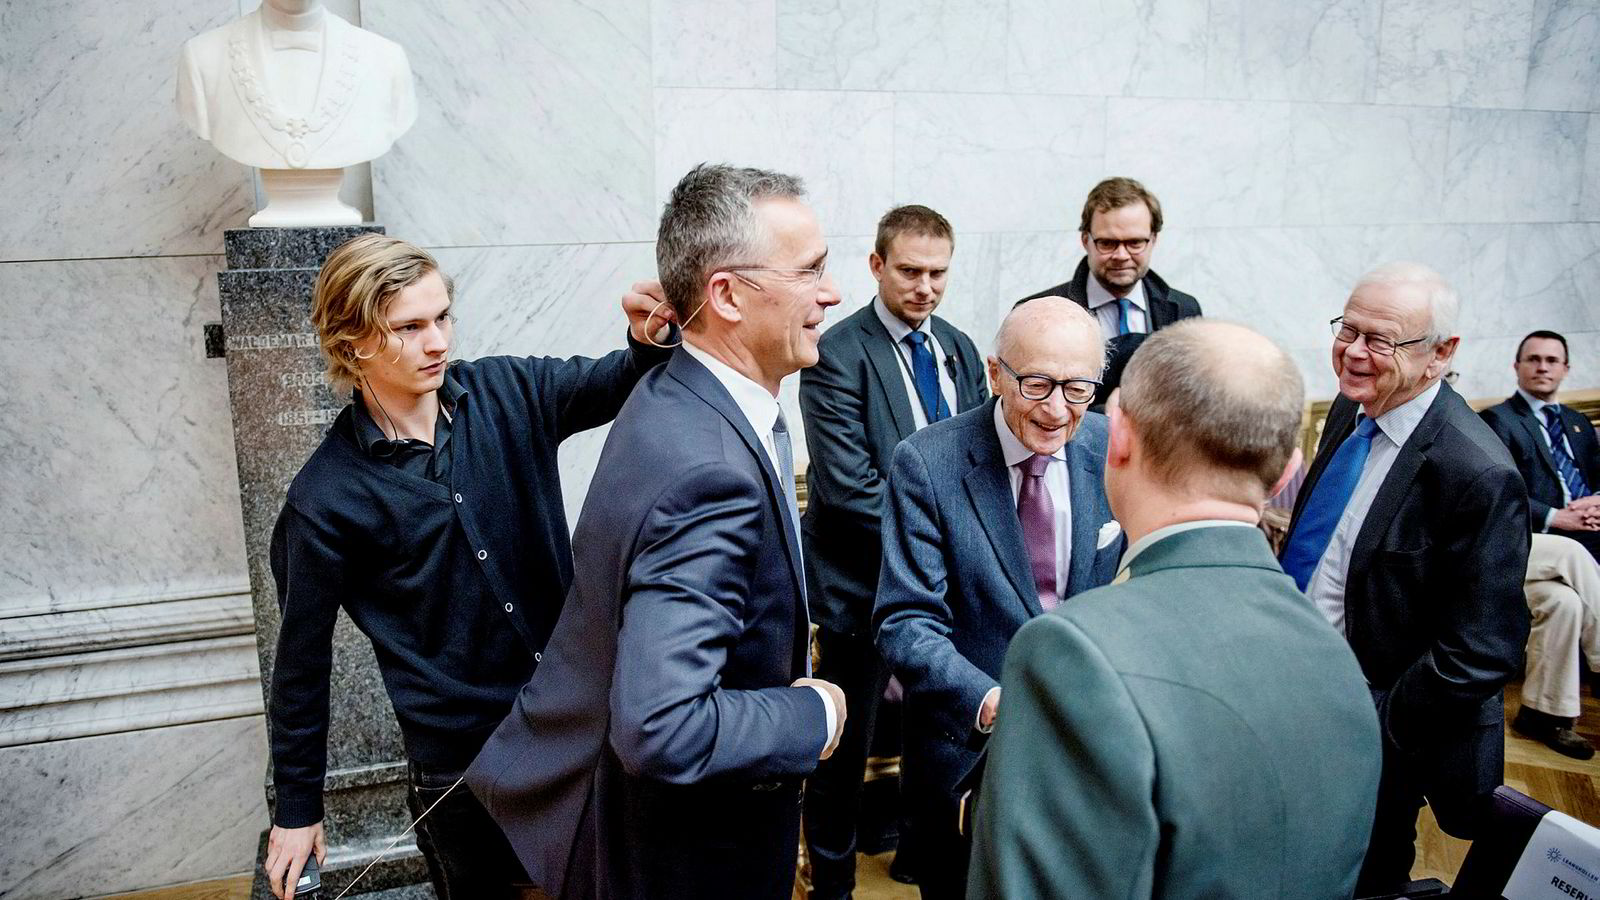 Natos generalsekretær Jens Stoltenberg (med mikrofon) møtte tidligere statsminister Kåre Willoch (med lilla slips) under en konferanse arrangert av Den norske Atlanterhavskomité i Universitet i Oslos aula mandag formiddag. Foto: